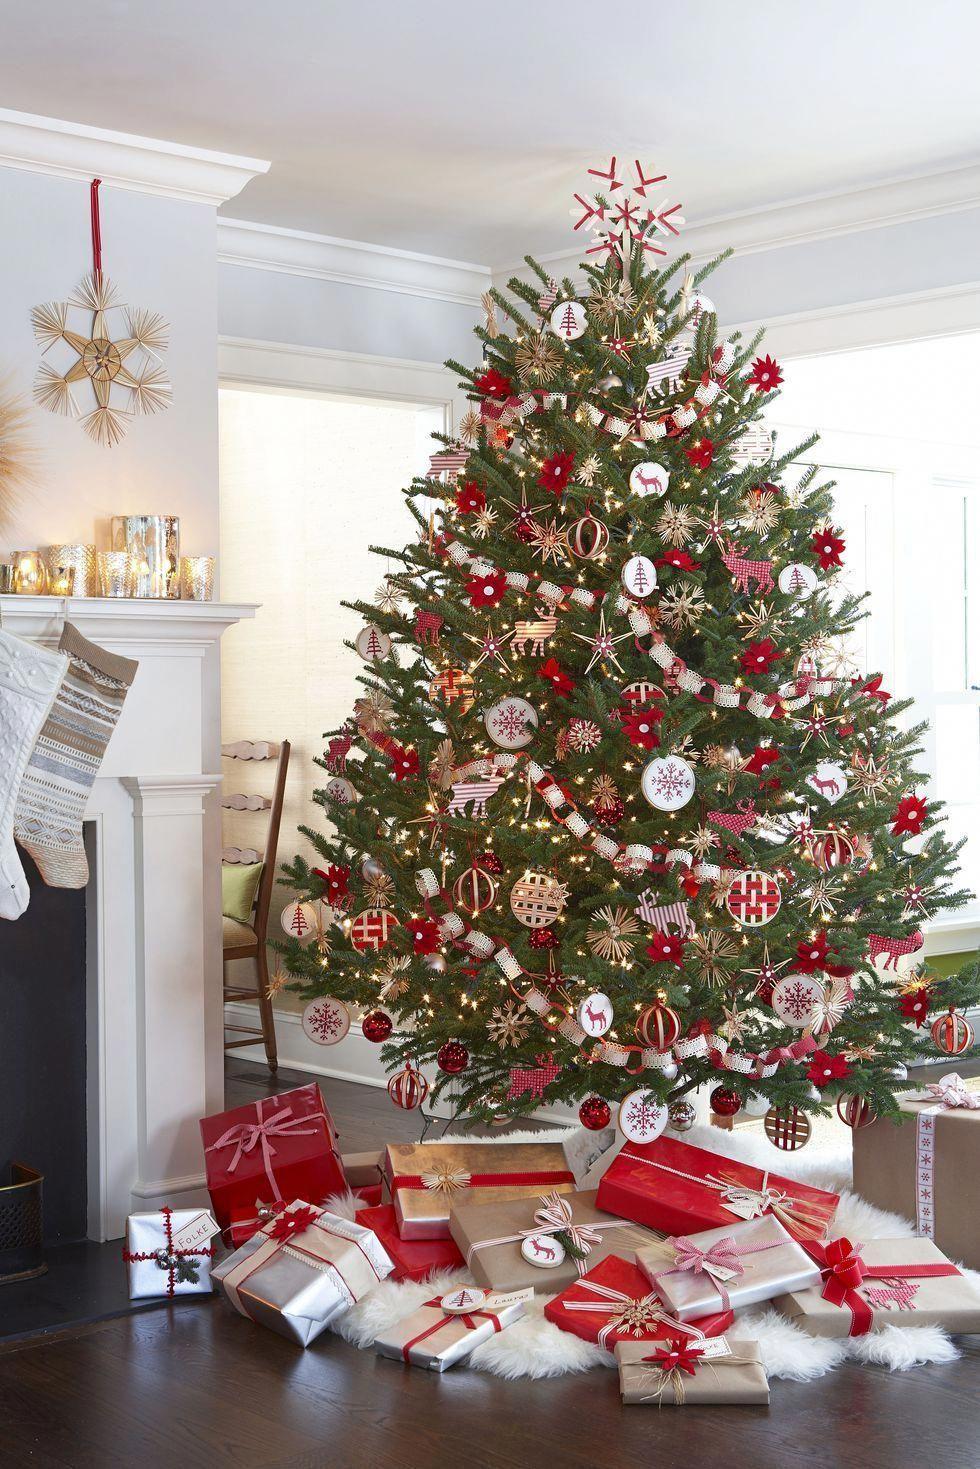 Scandinavian Christmas Tree Christmasdecorations Christmas Christmasdecorati In 2020 Elegant Christmas Tree Decorations White Christmas Decor Elegant Christmas Trees